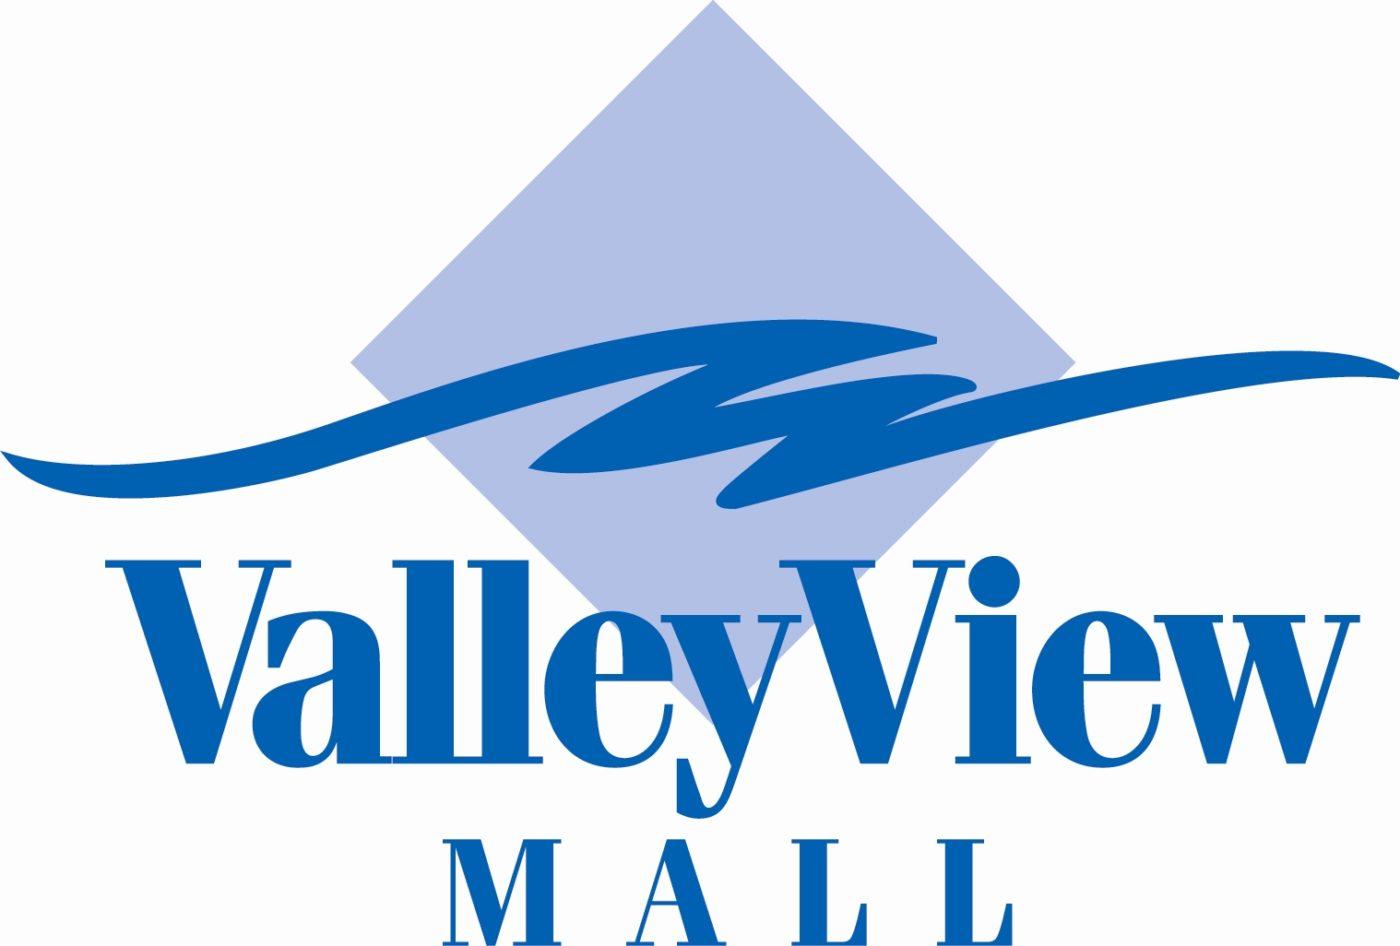 Valley View Mall celebrates 38th anniversary